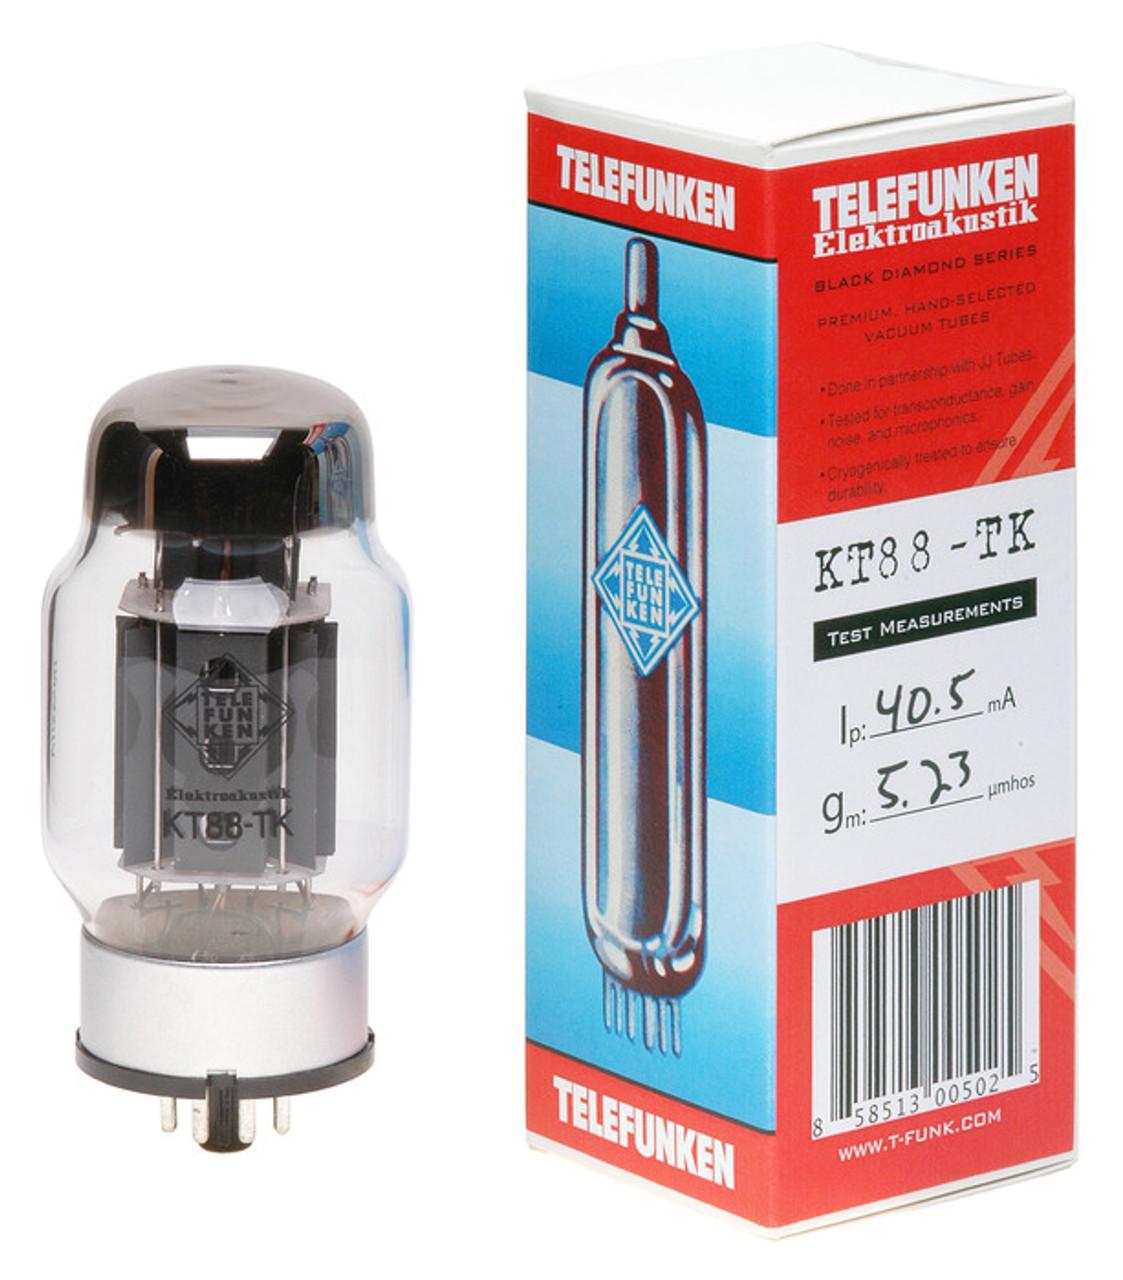 Telefunken Kt88-tk Vacuum Tube